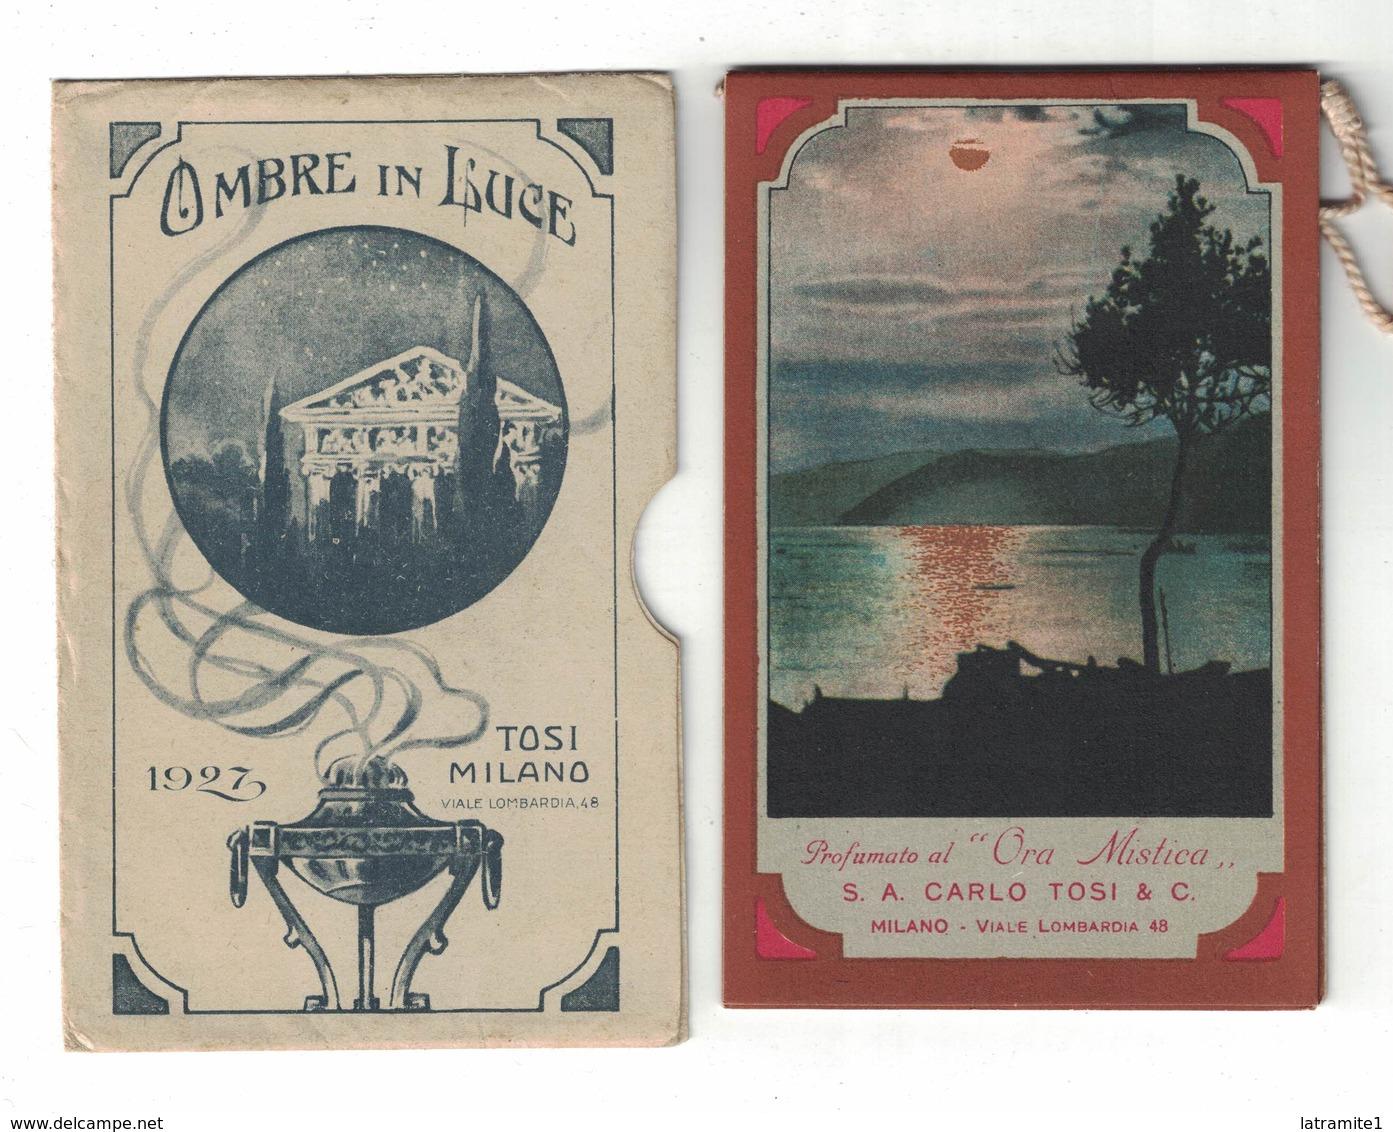 CALENDARIETTO  TOSI  1927  OMBRE IN LUCE - Calendari